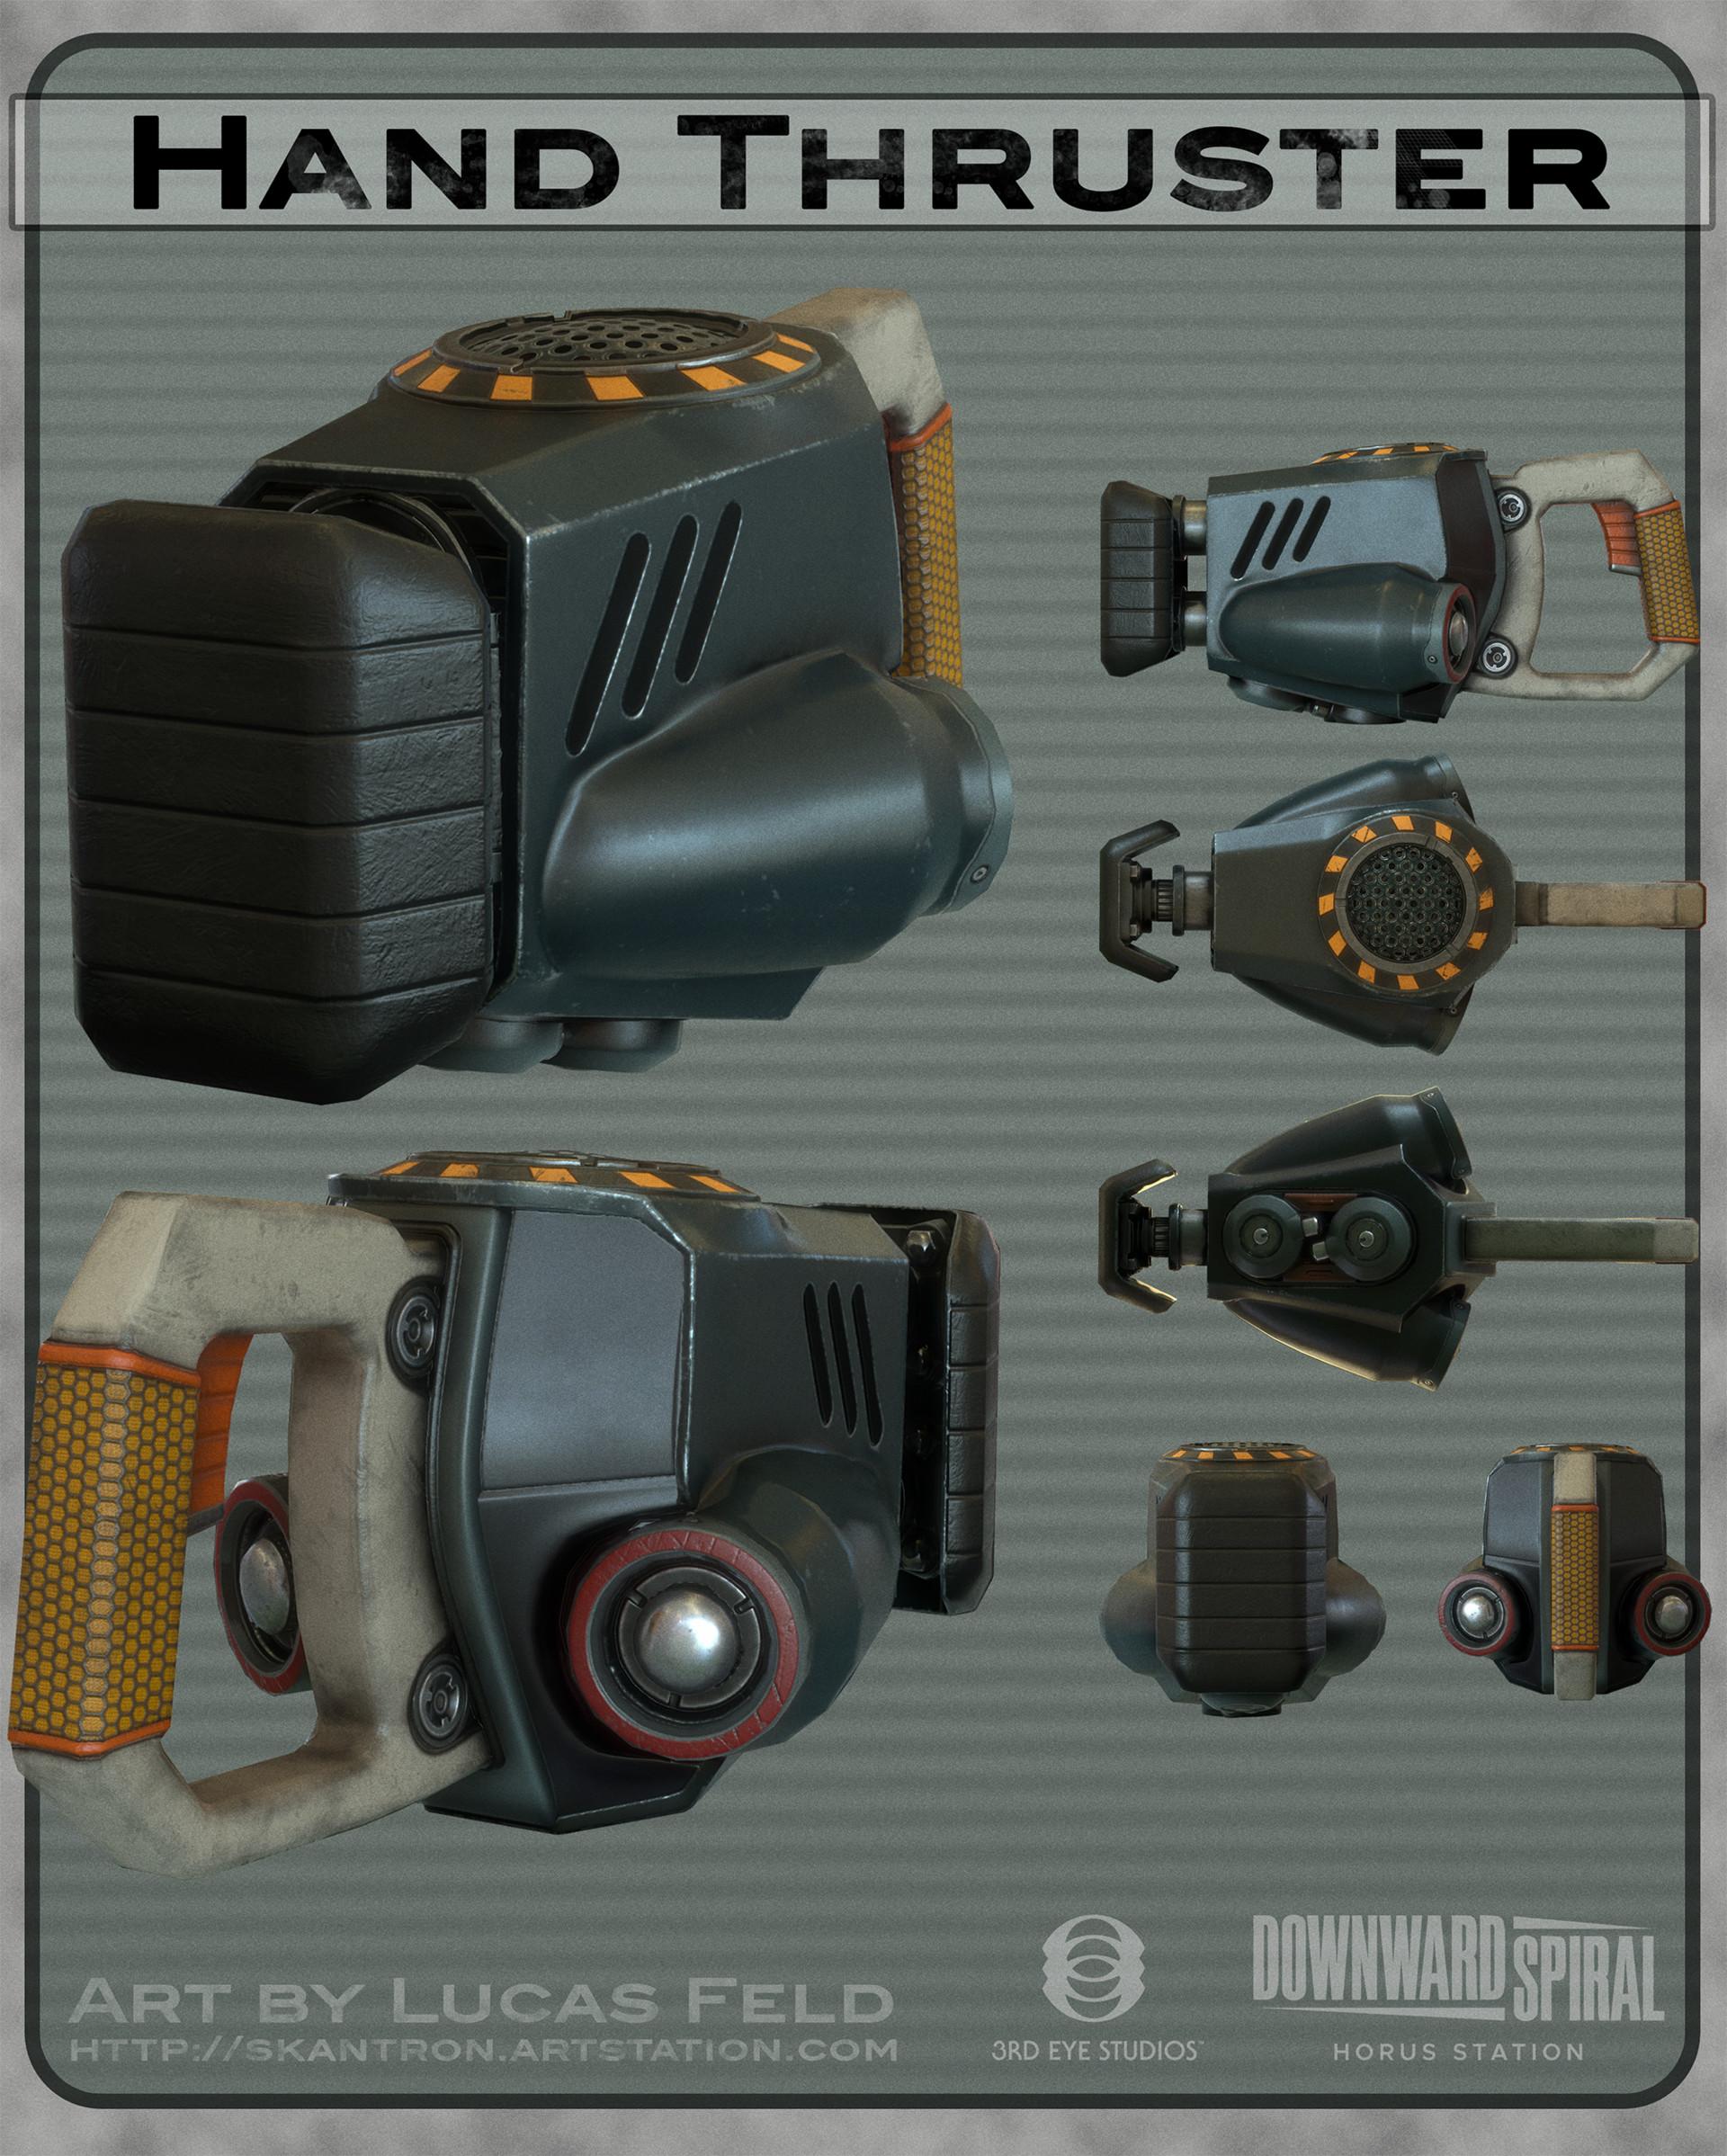 Lucas feld weaponsprex handthruster